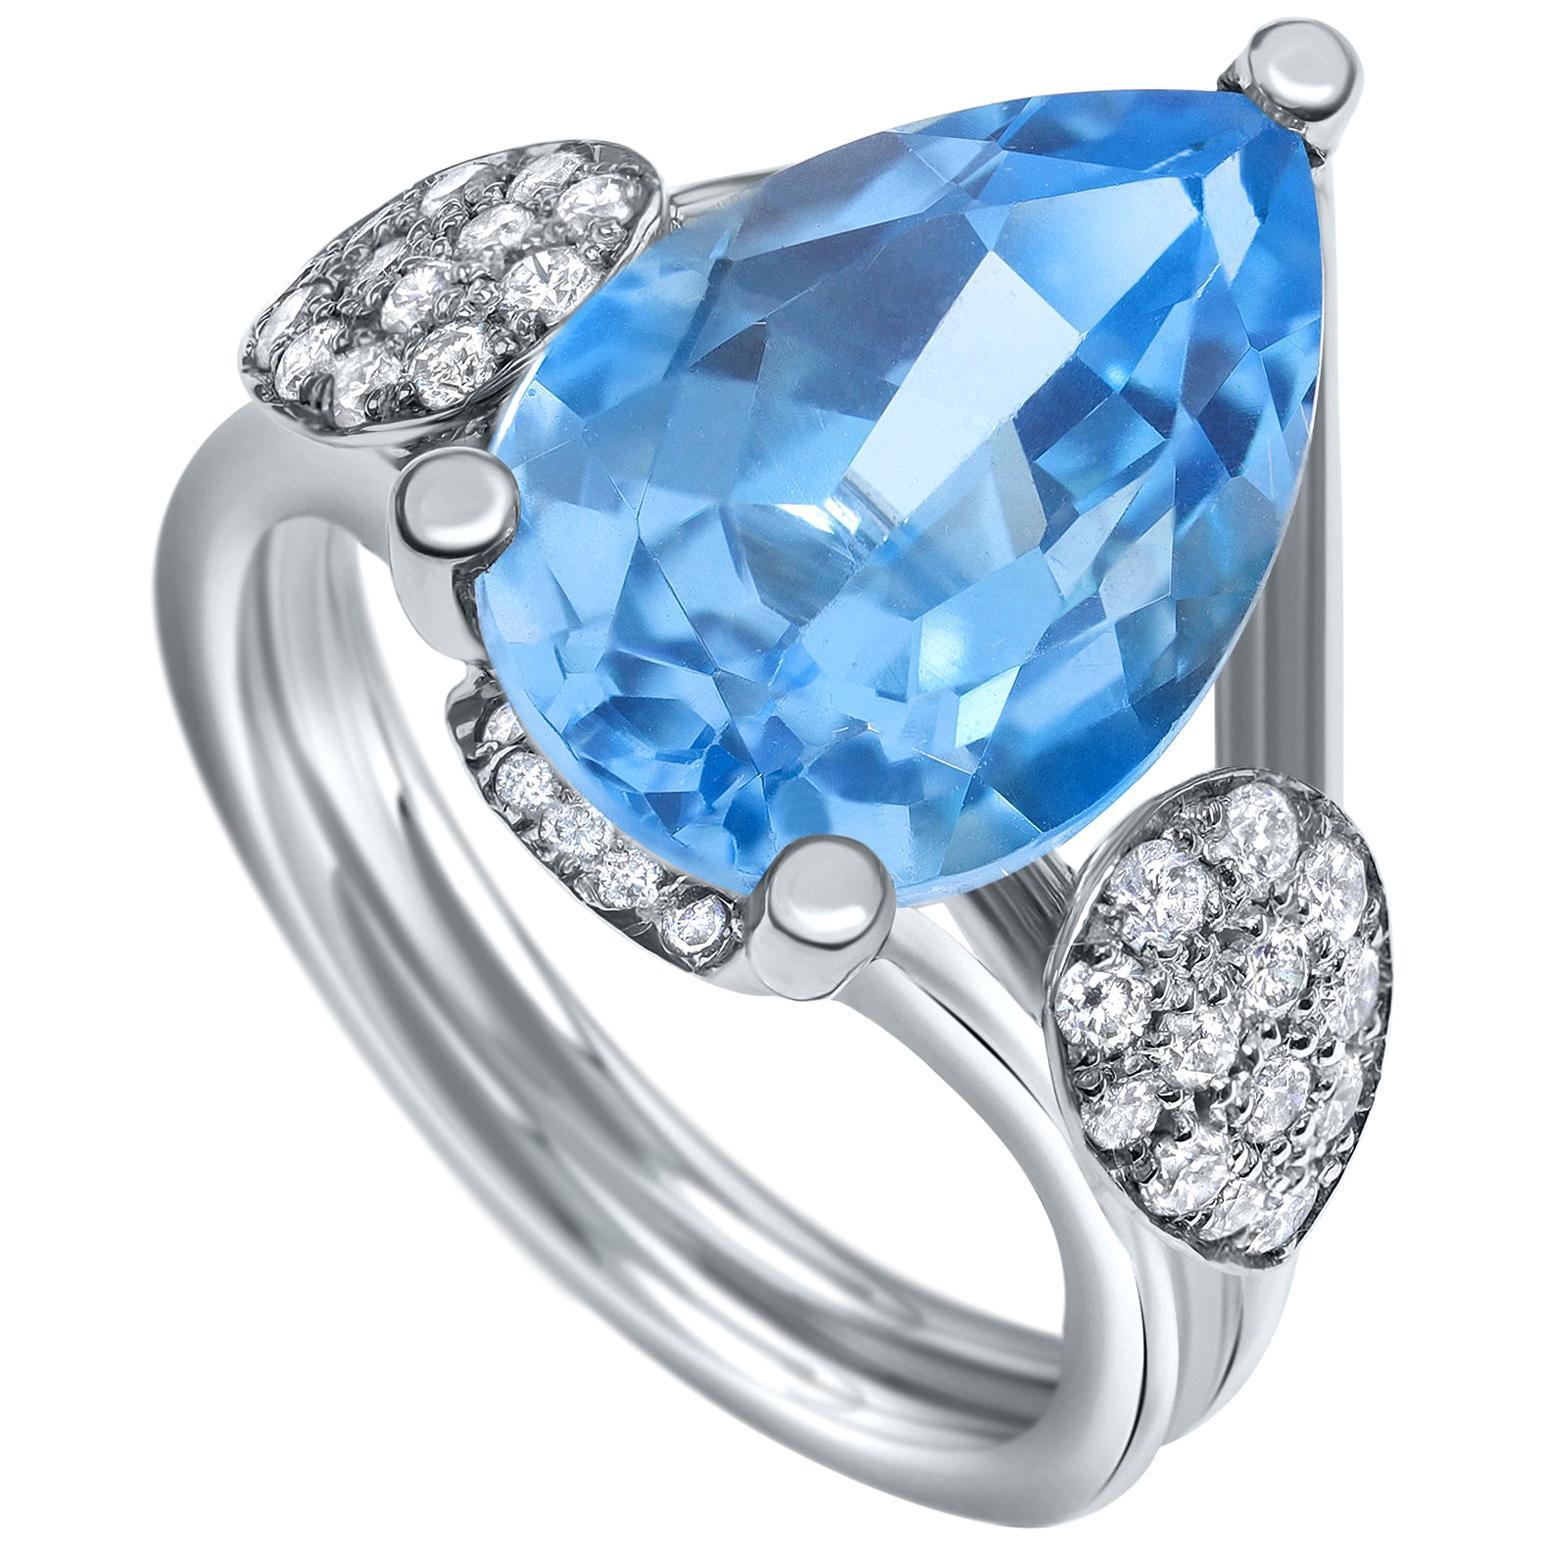 8.00 Carat Blue Topaz and Diamonds Ring in 14 Karat White Gold - Shlomit Rogel